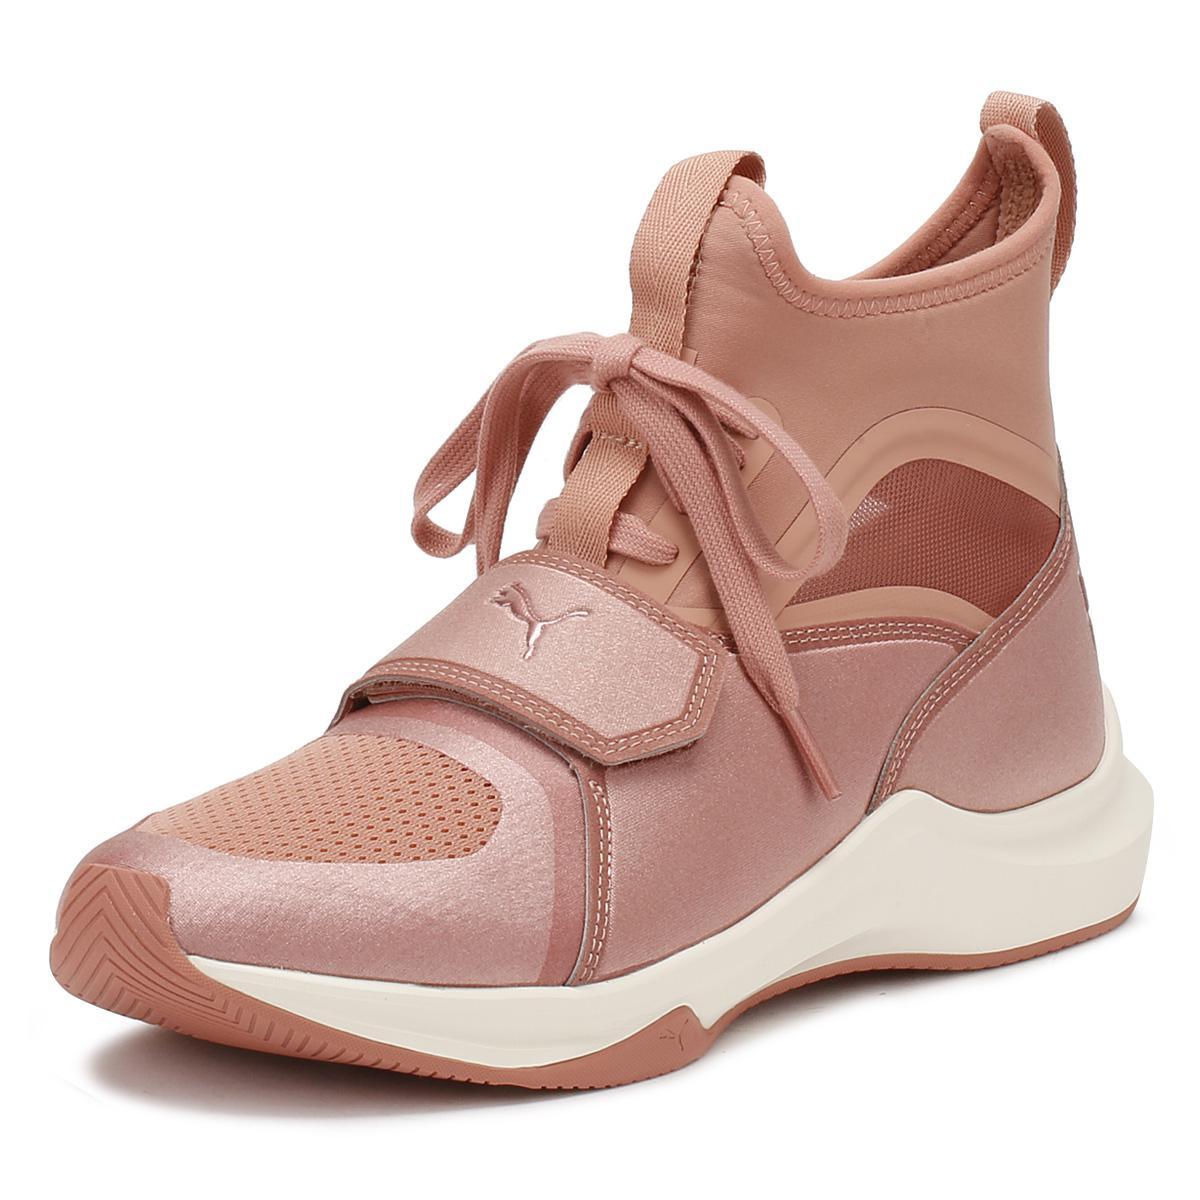 In Lyst Gomez Puma Womens Pink Save Trainers Selena Phenom 0aaSPxqRw